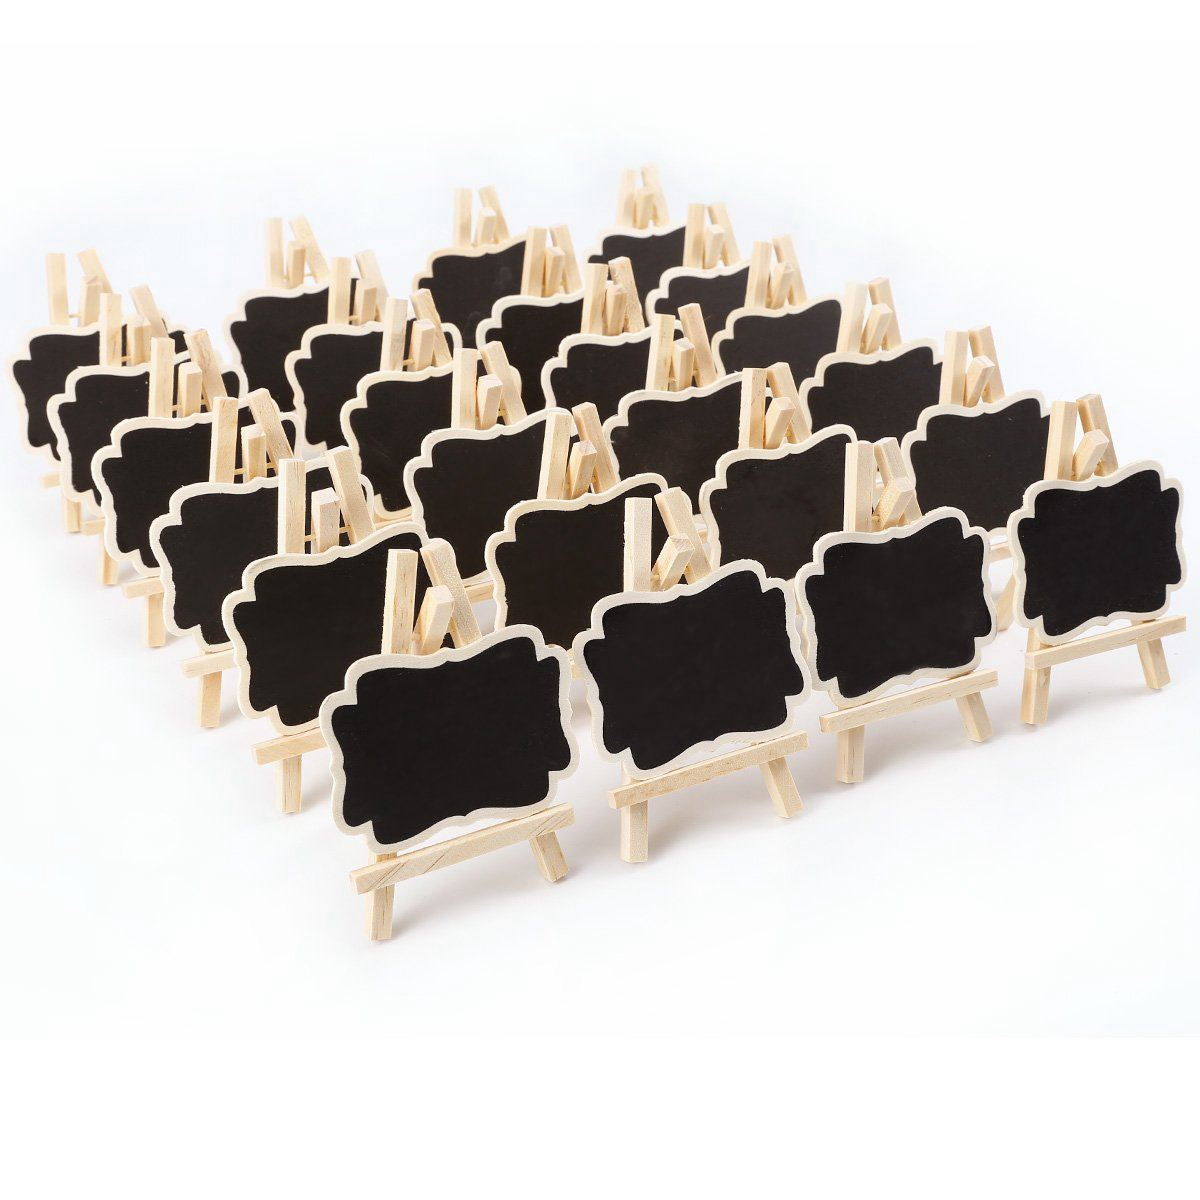 24 PCS Mini Wooden Blackboard Message Rectangular Slate Board Cards memo label Signs Price Digit Table24 PCS Mini Wooden Blackboard Message Rectangular Slate Board Cards memo label Signs Price Digit Table